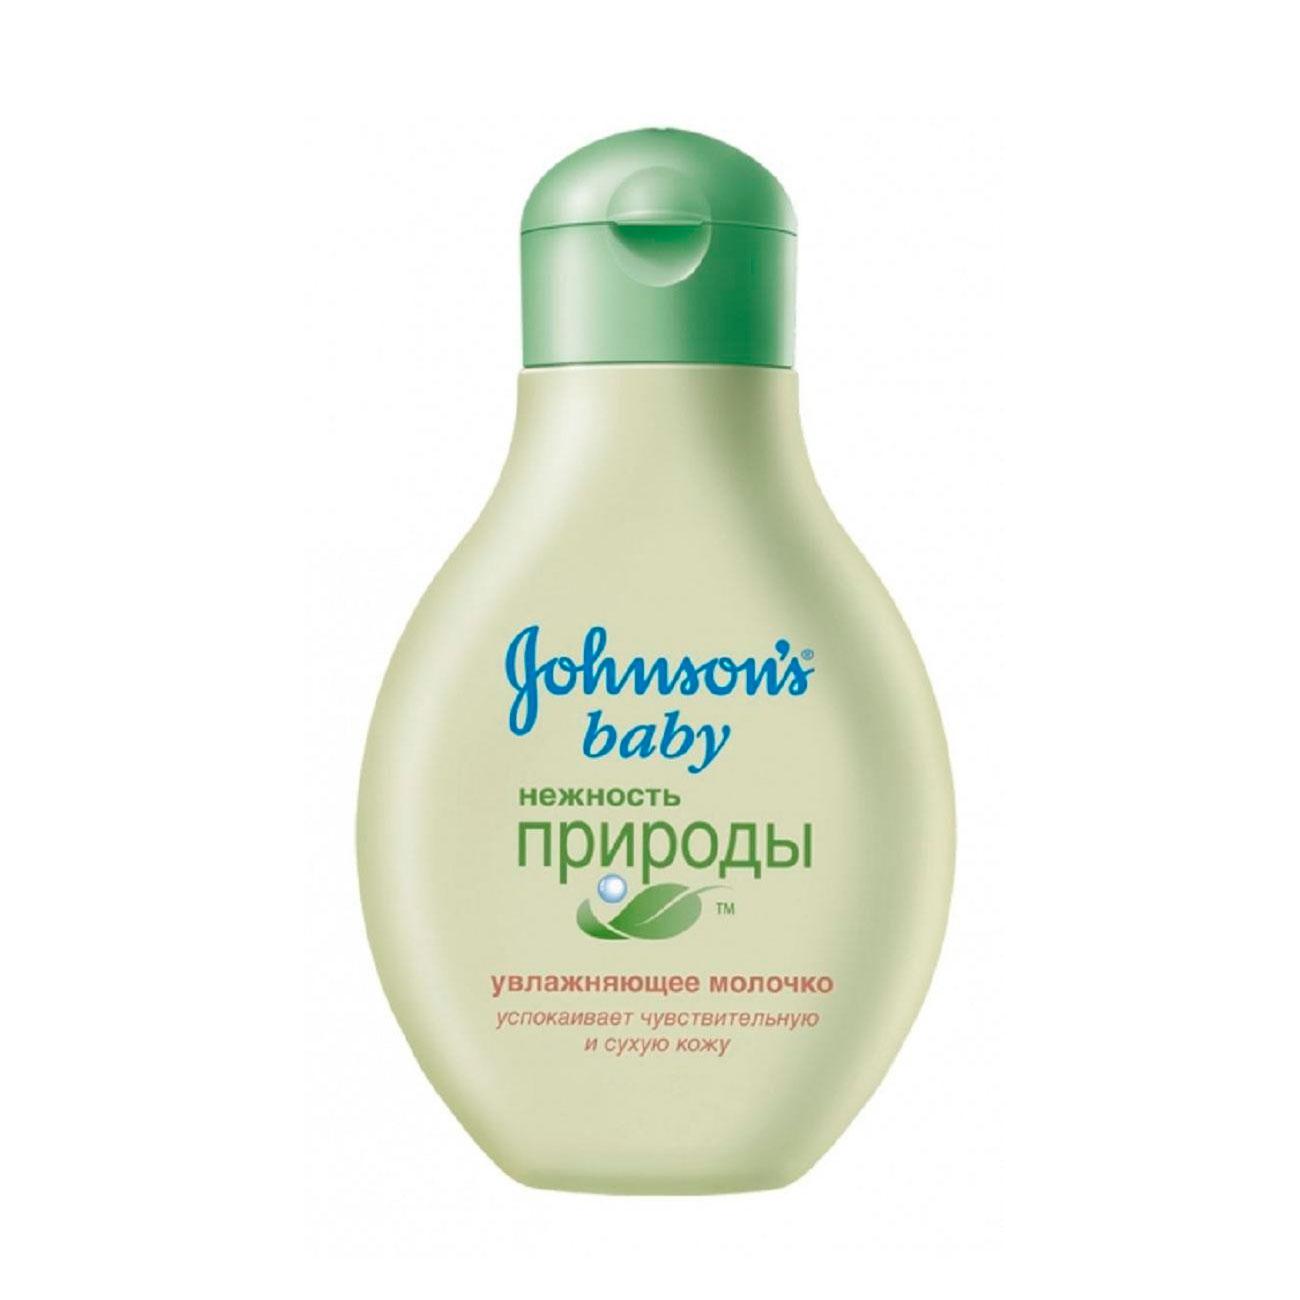 ������� Johnson's baby �������� ������� ����������� 250��